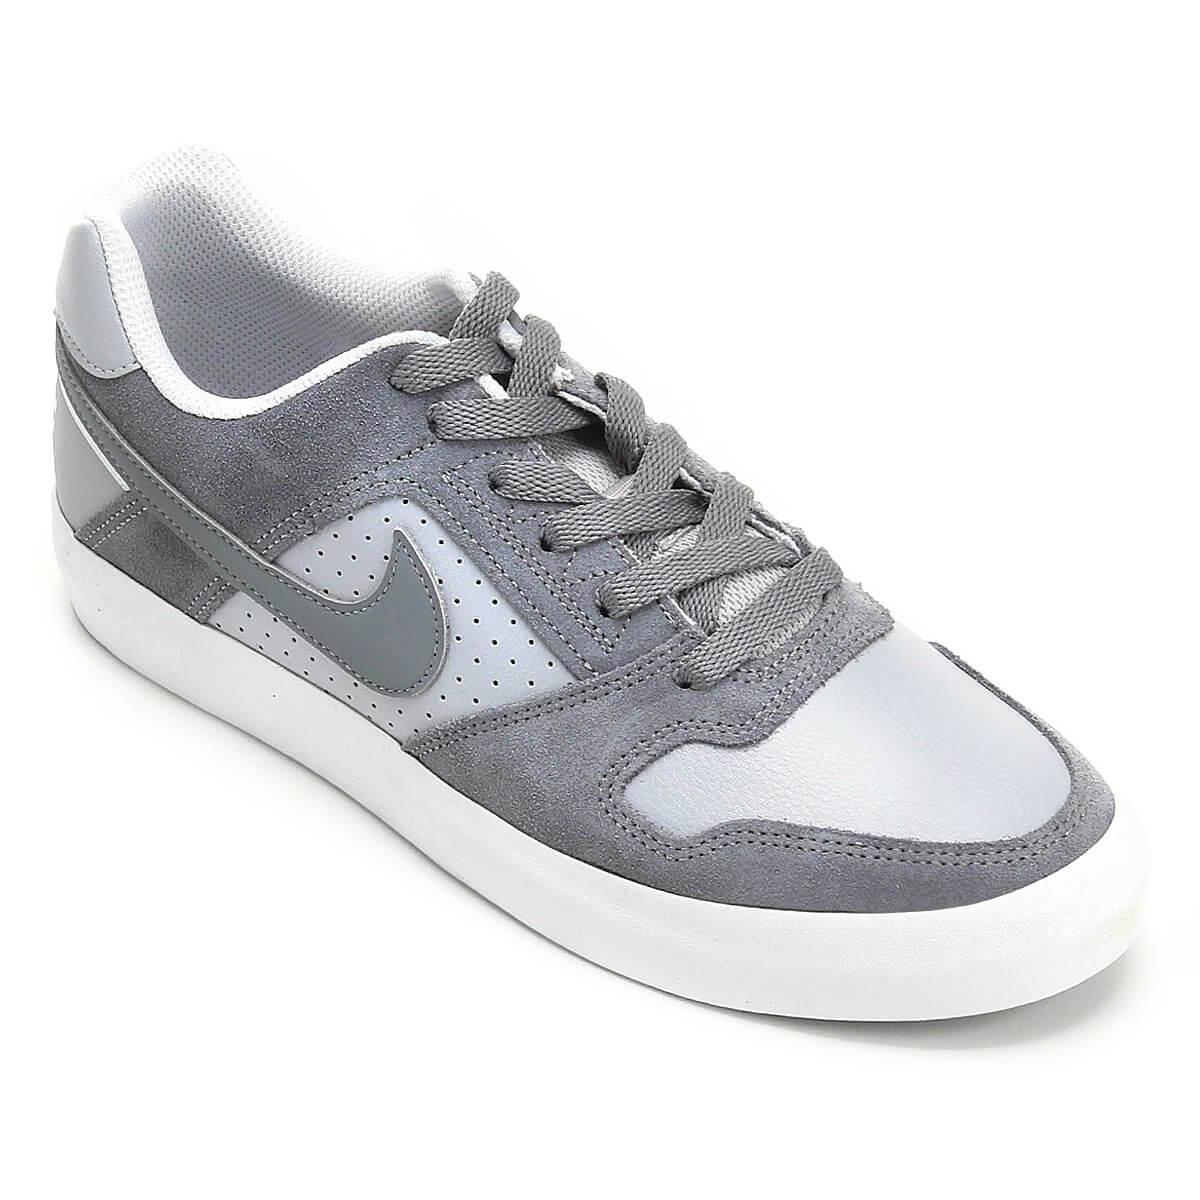 Tênis Nike SB Delta Force Vulc Casual Masculino - Decker Online! 3573f6e68b779